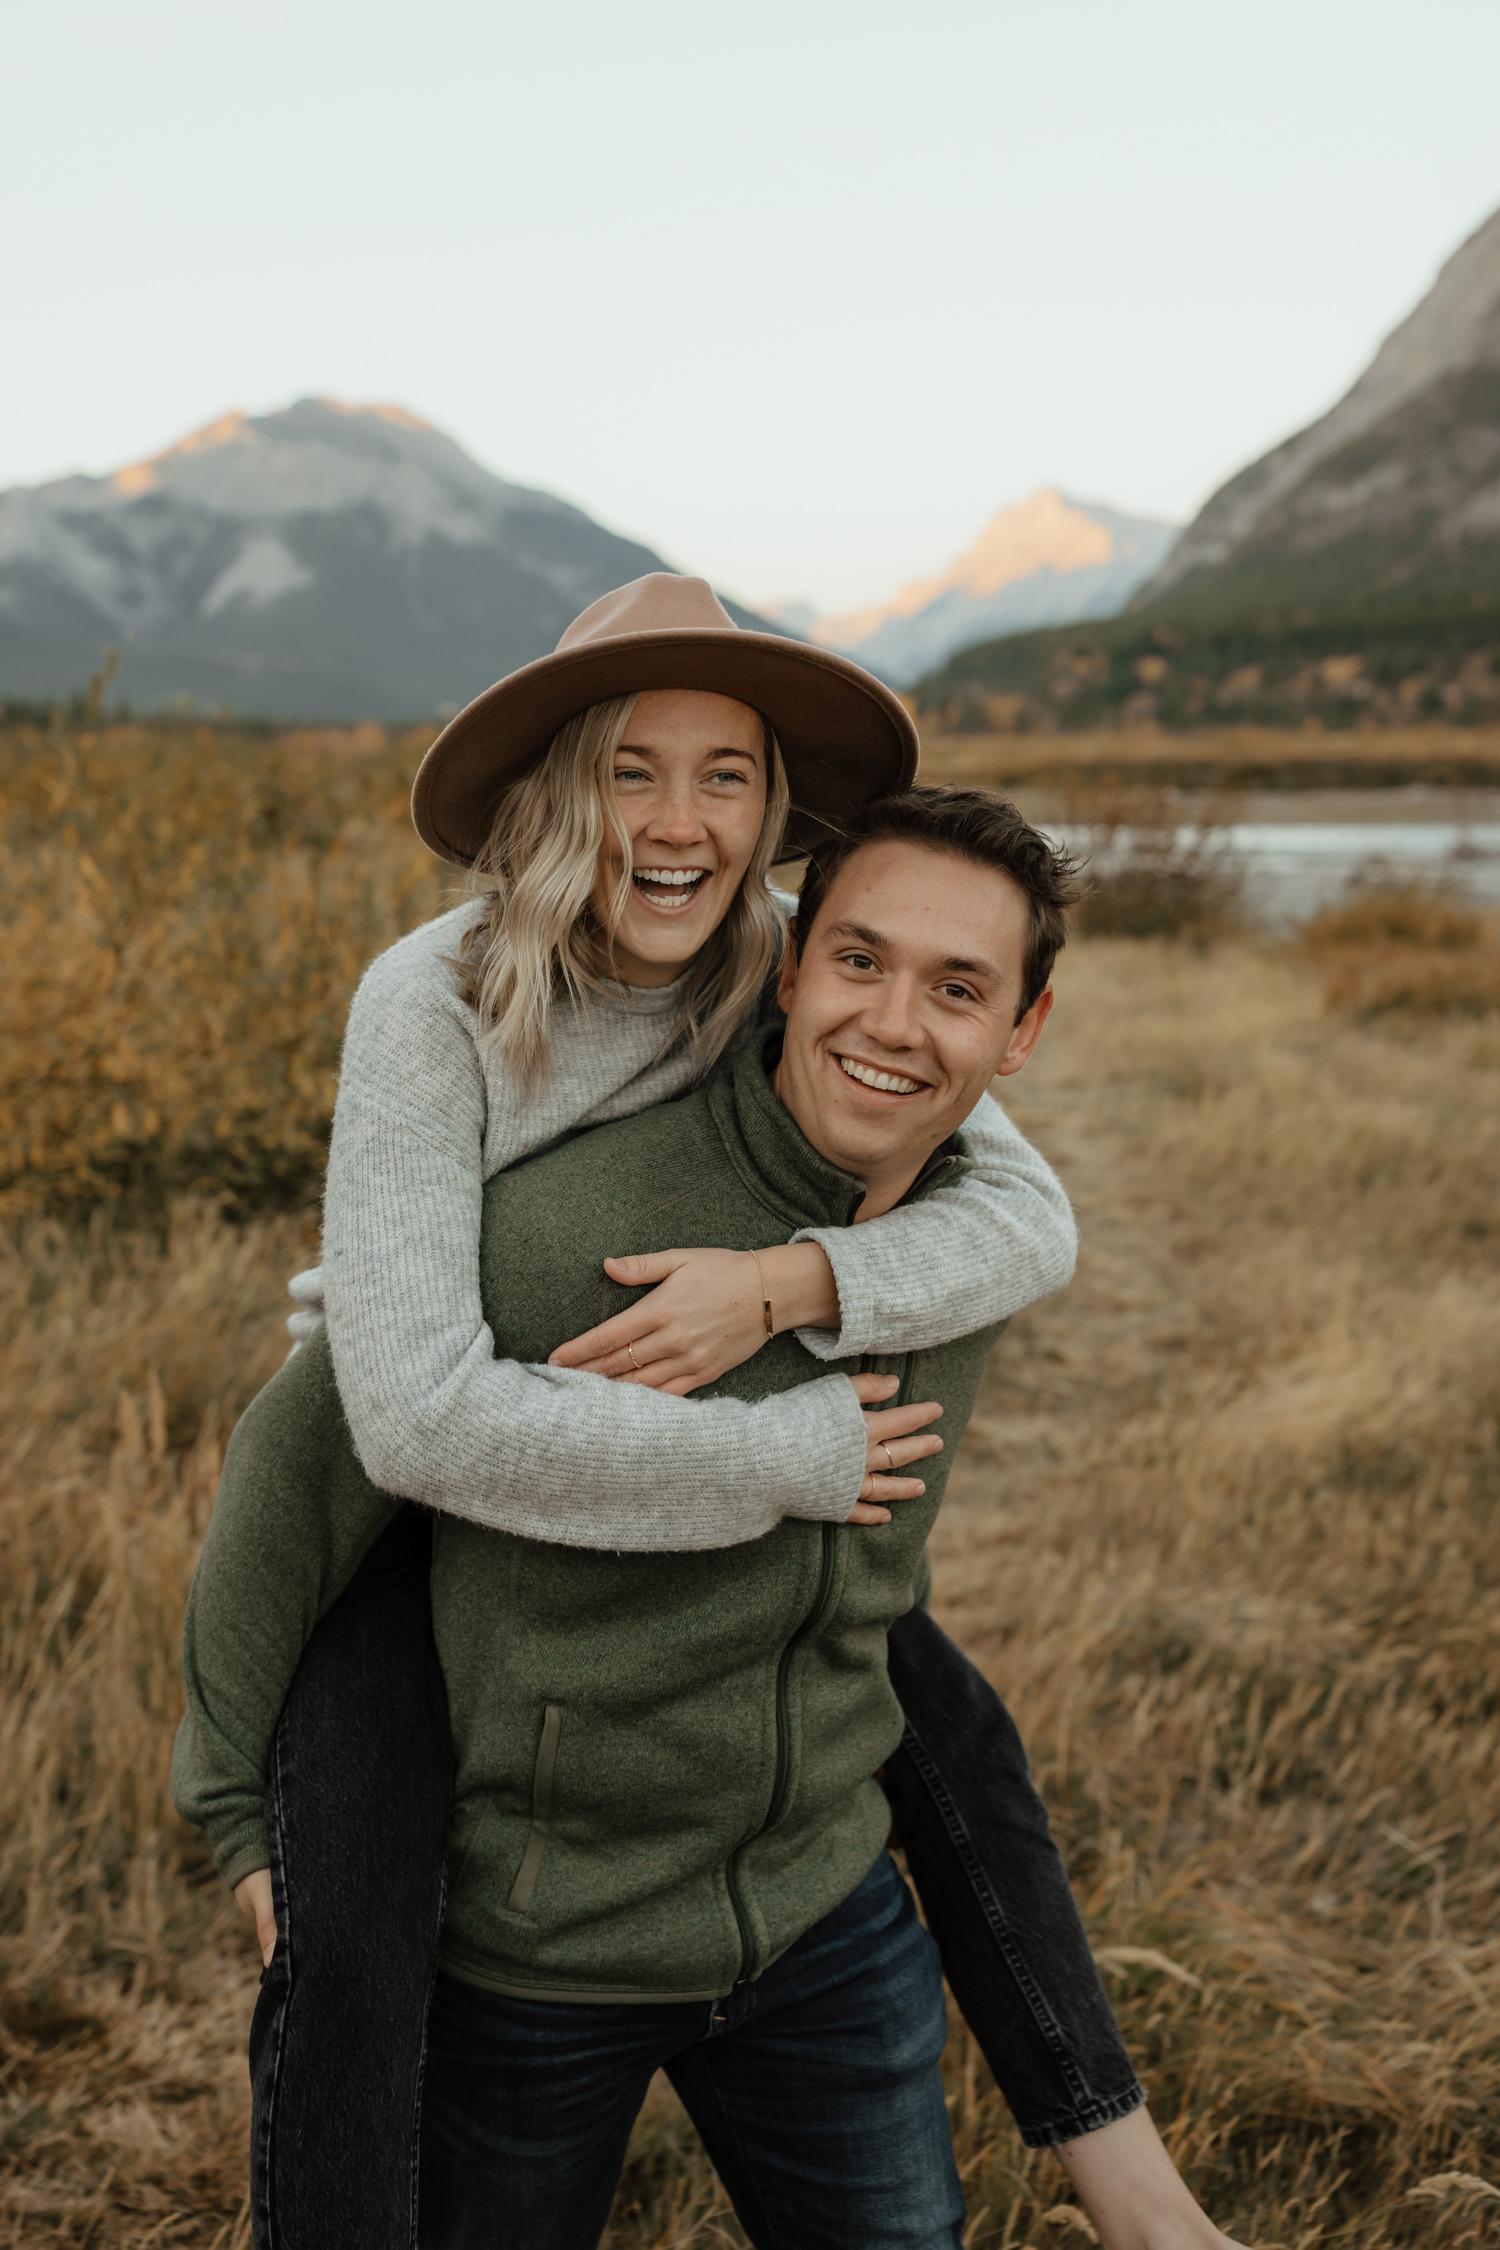 Fall Couple Session near Barrier Lake in Kananaskis, Alberta